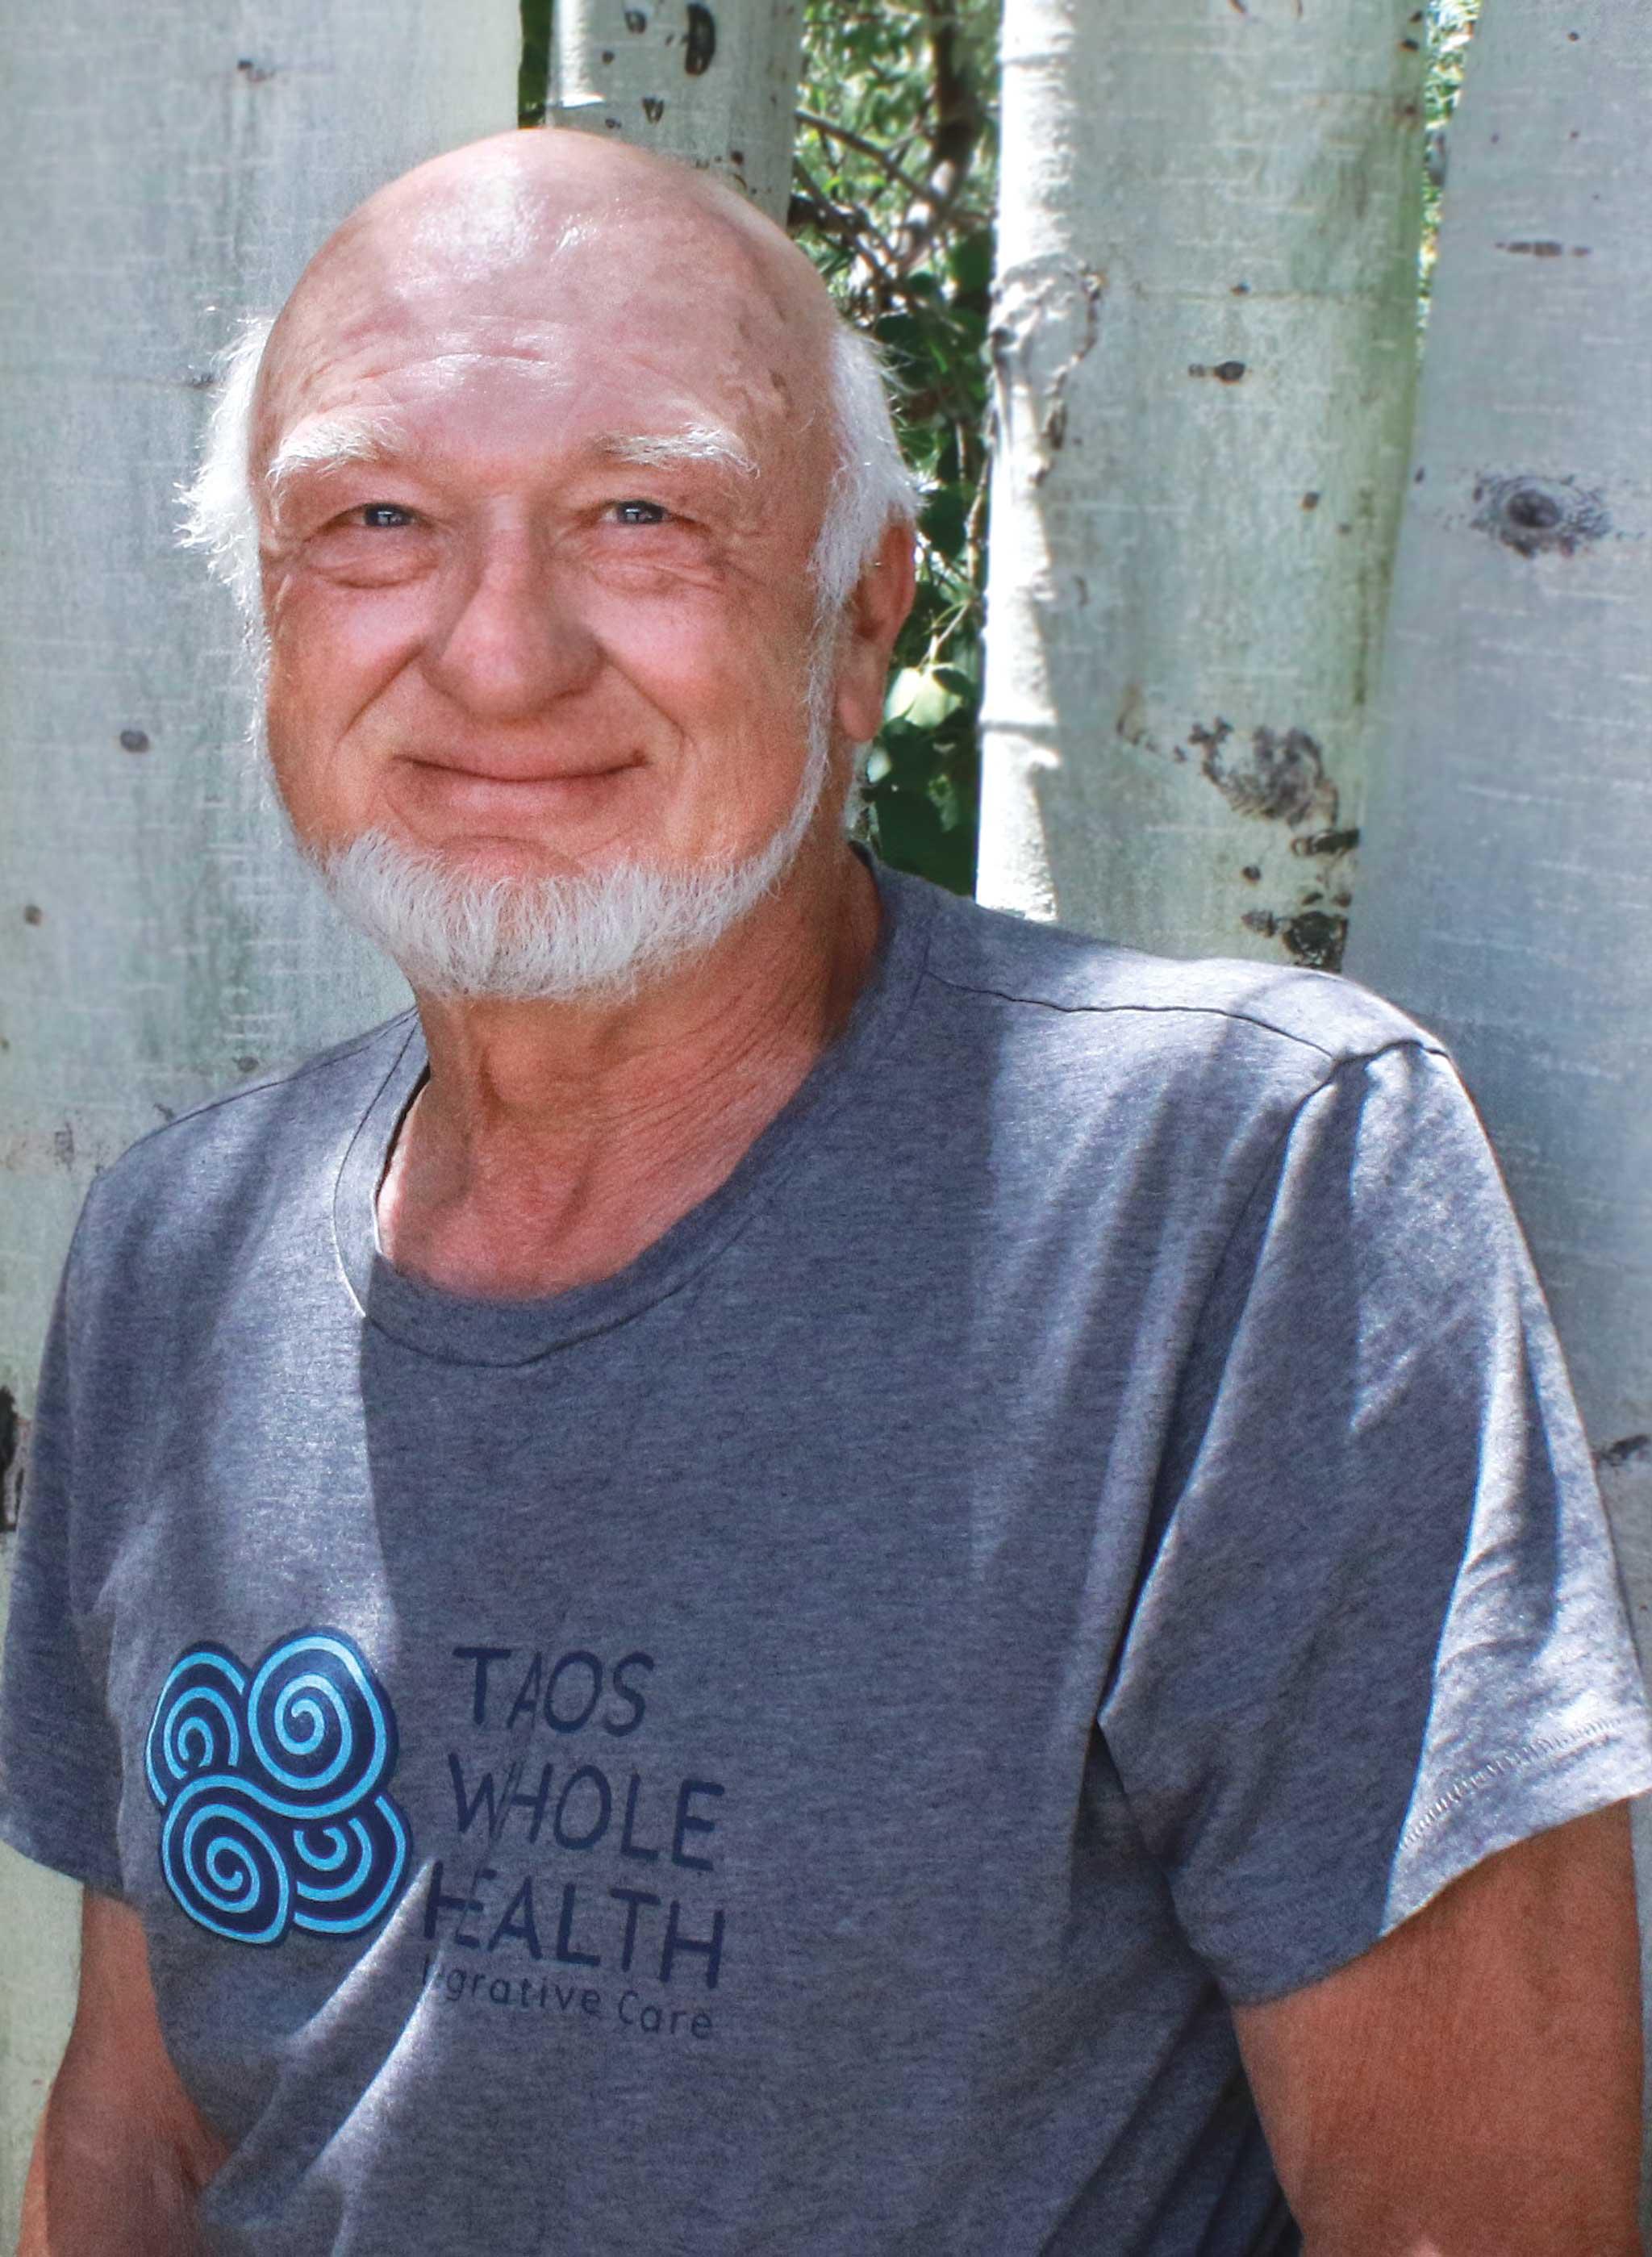 Taos Whole Health Integrative Care - Carl Wagner, DOM